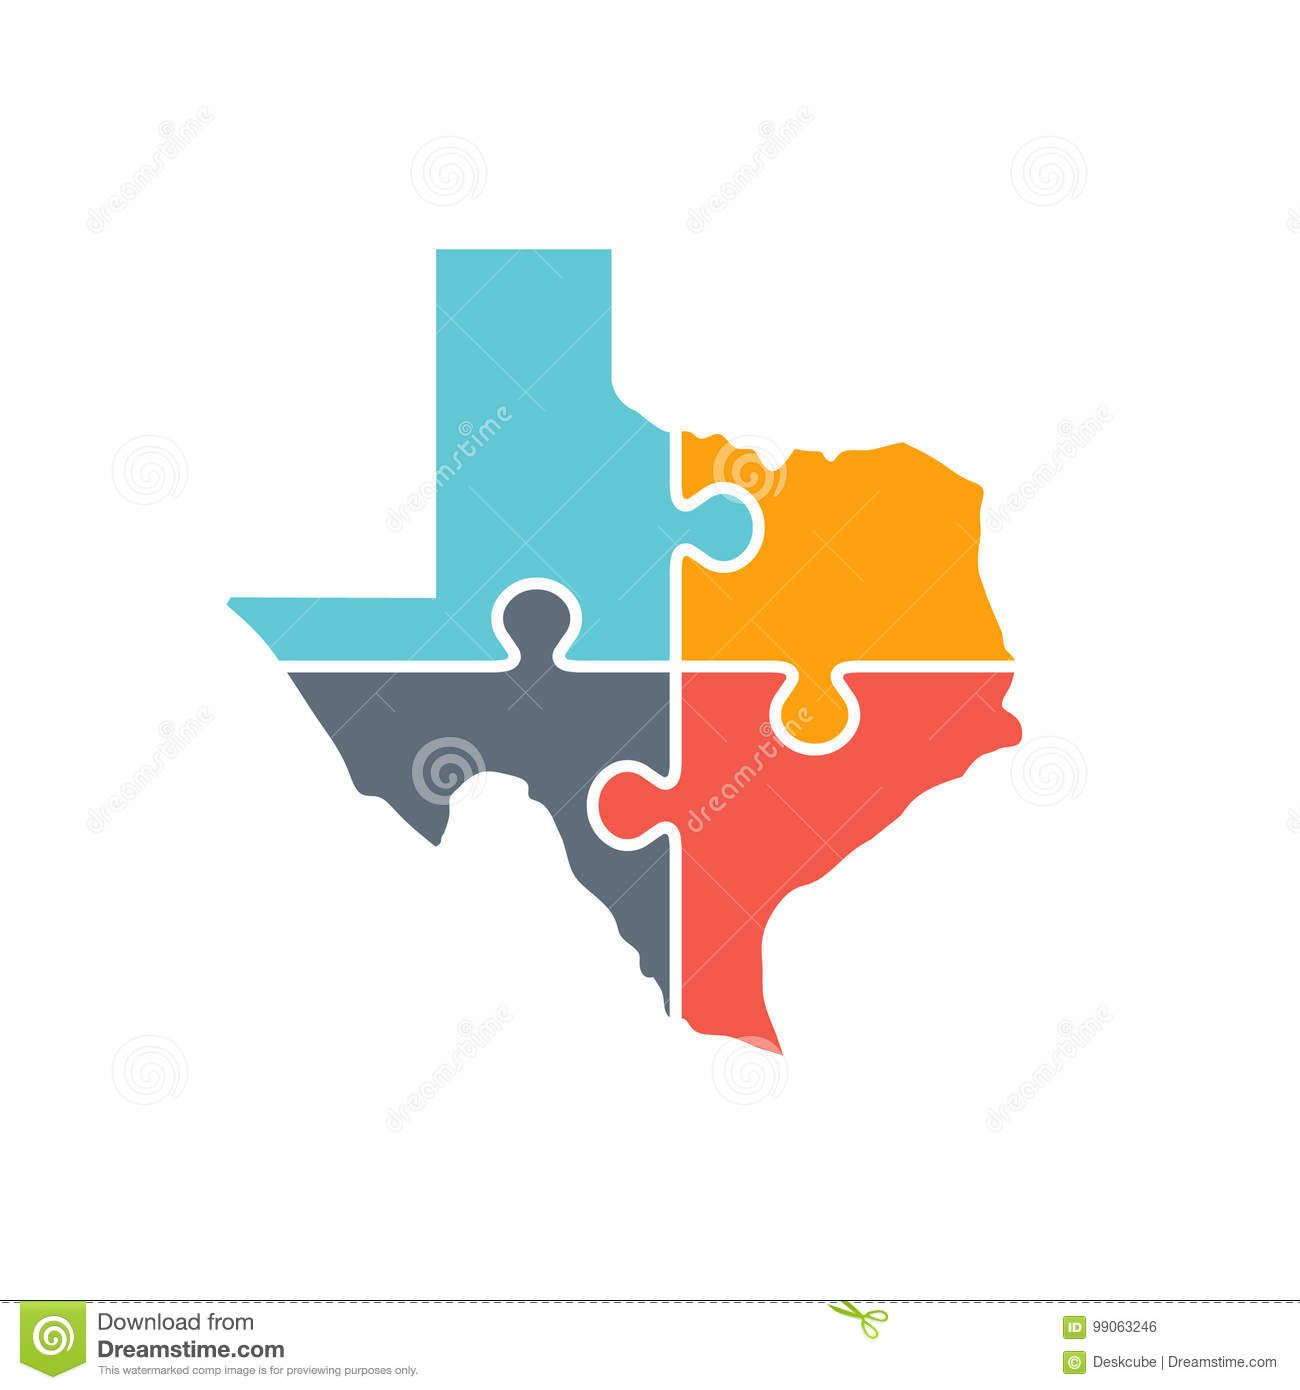 Texas map puzzle logo illustration dreamstime texas pinterest texas map puzzle logo illustration gumiabroncs Choice Image